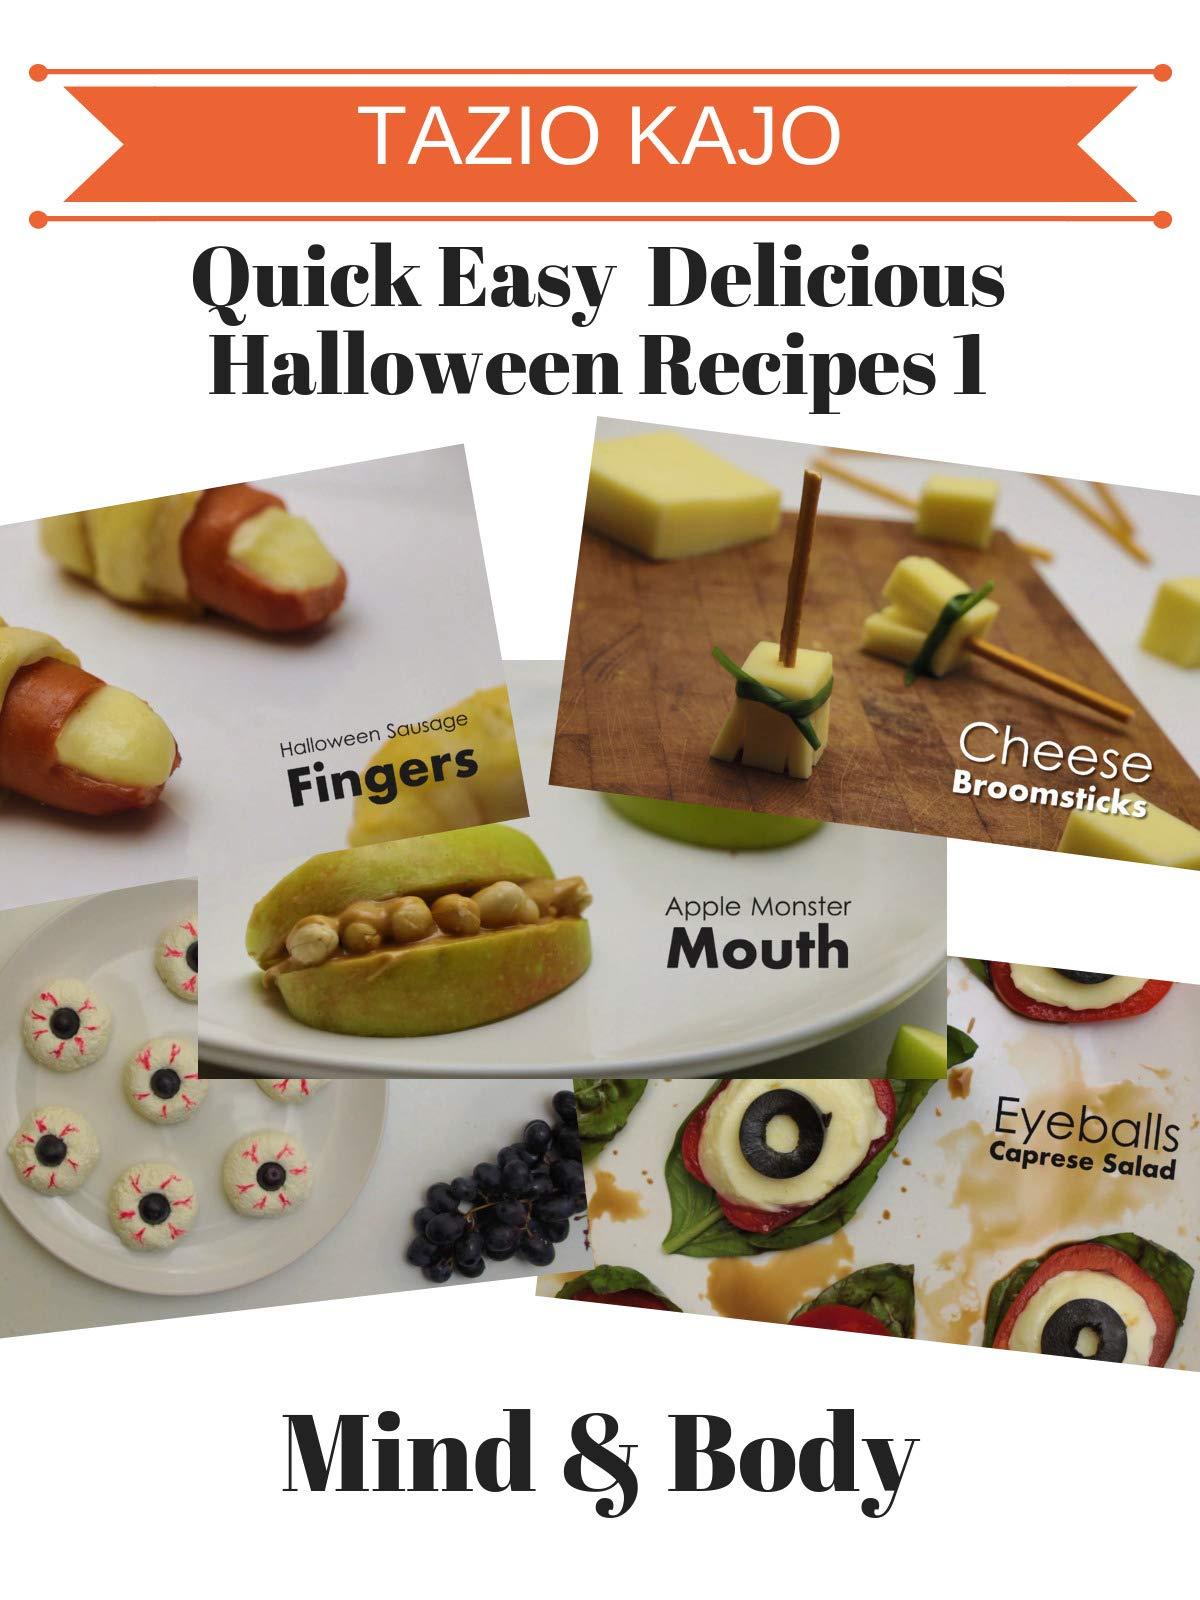 Quick Easy & Delicious Halloween Recipes 1